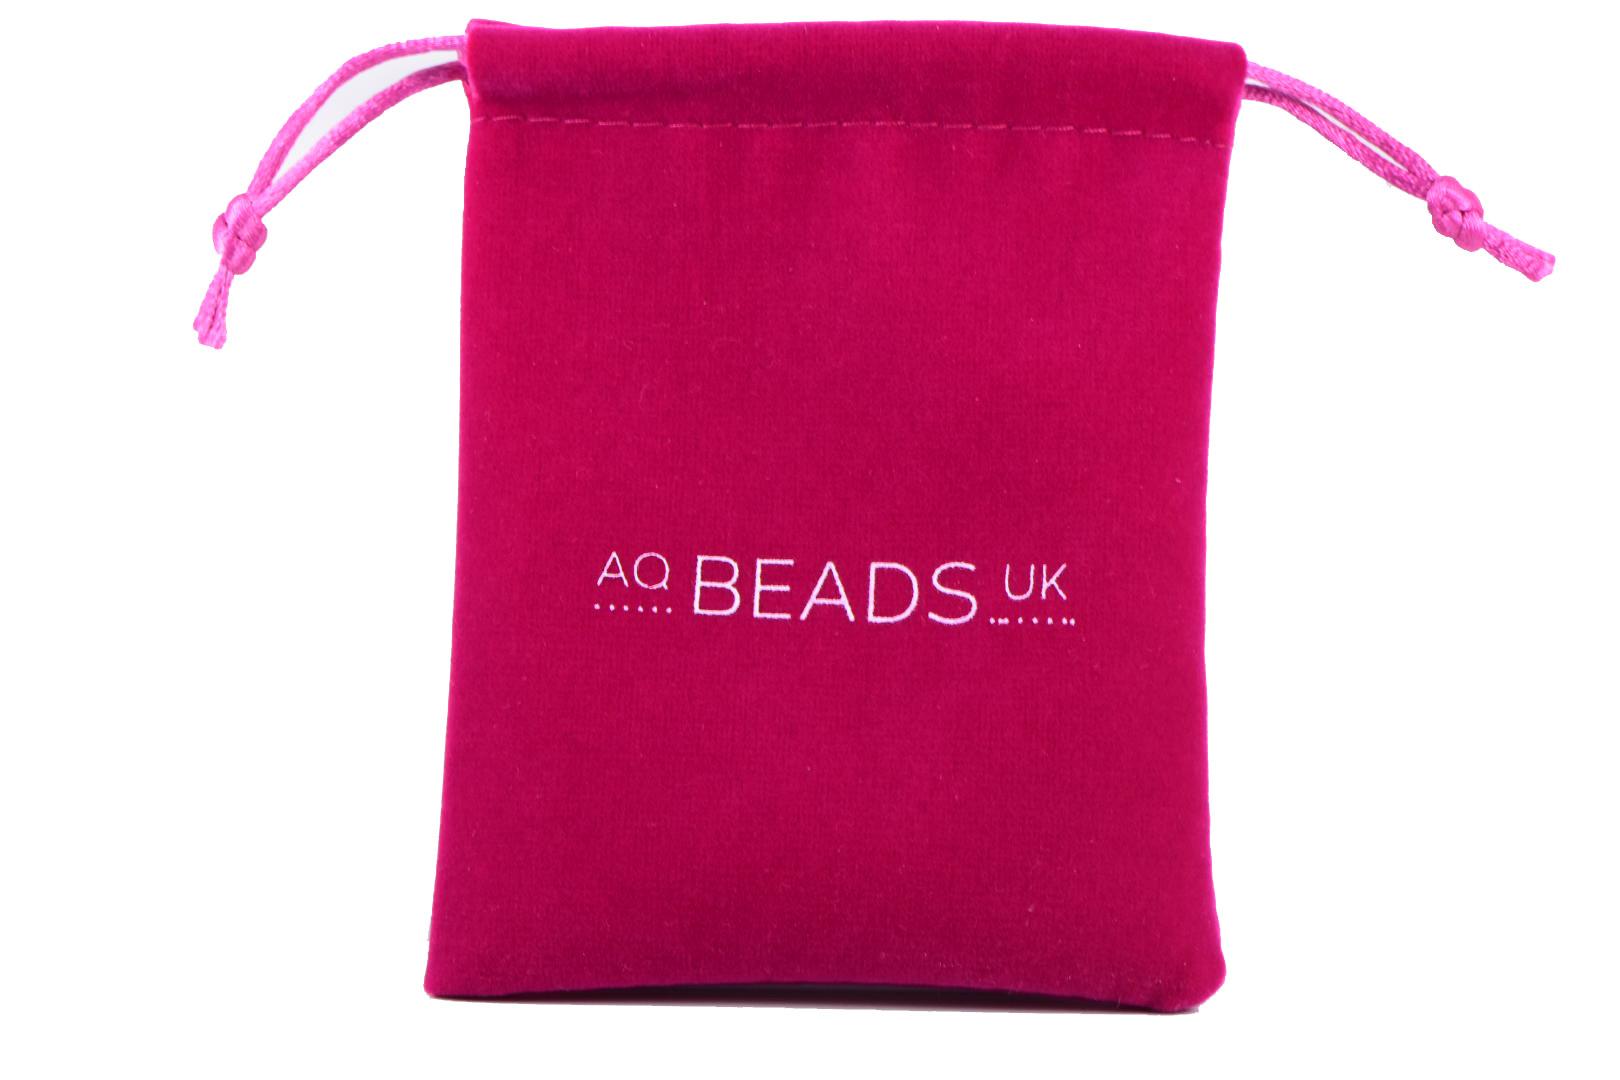 AqBeadsUk Classic Semi-Precious 8mm Gemstone Dark Orange,Pink Jade Faceted Round Beads 19 inch Luxury Handmade Women's Necklace